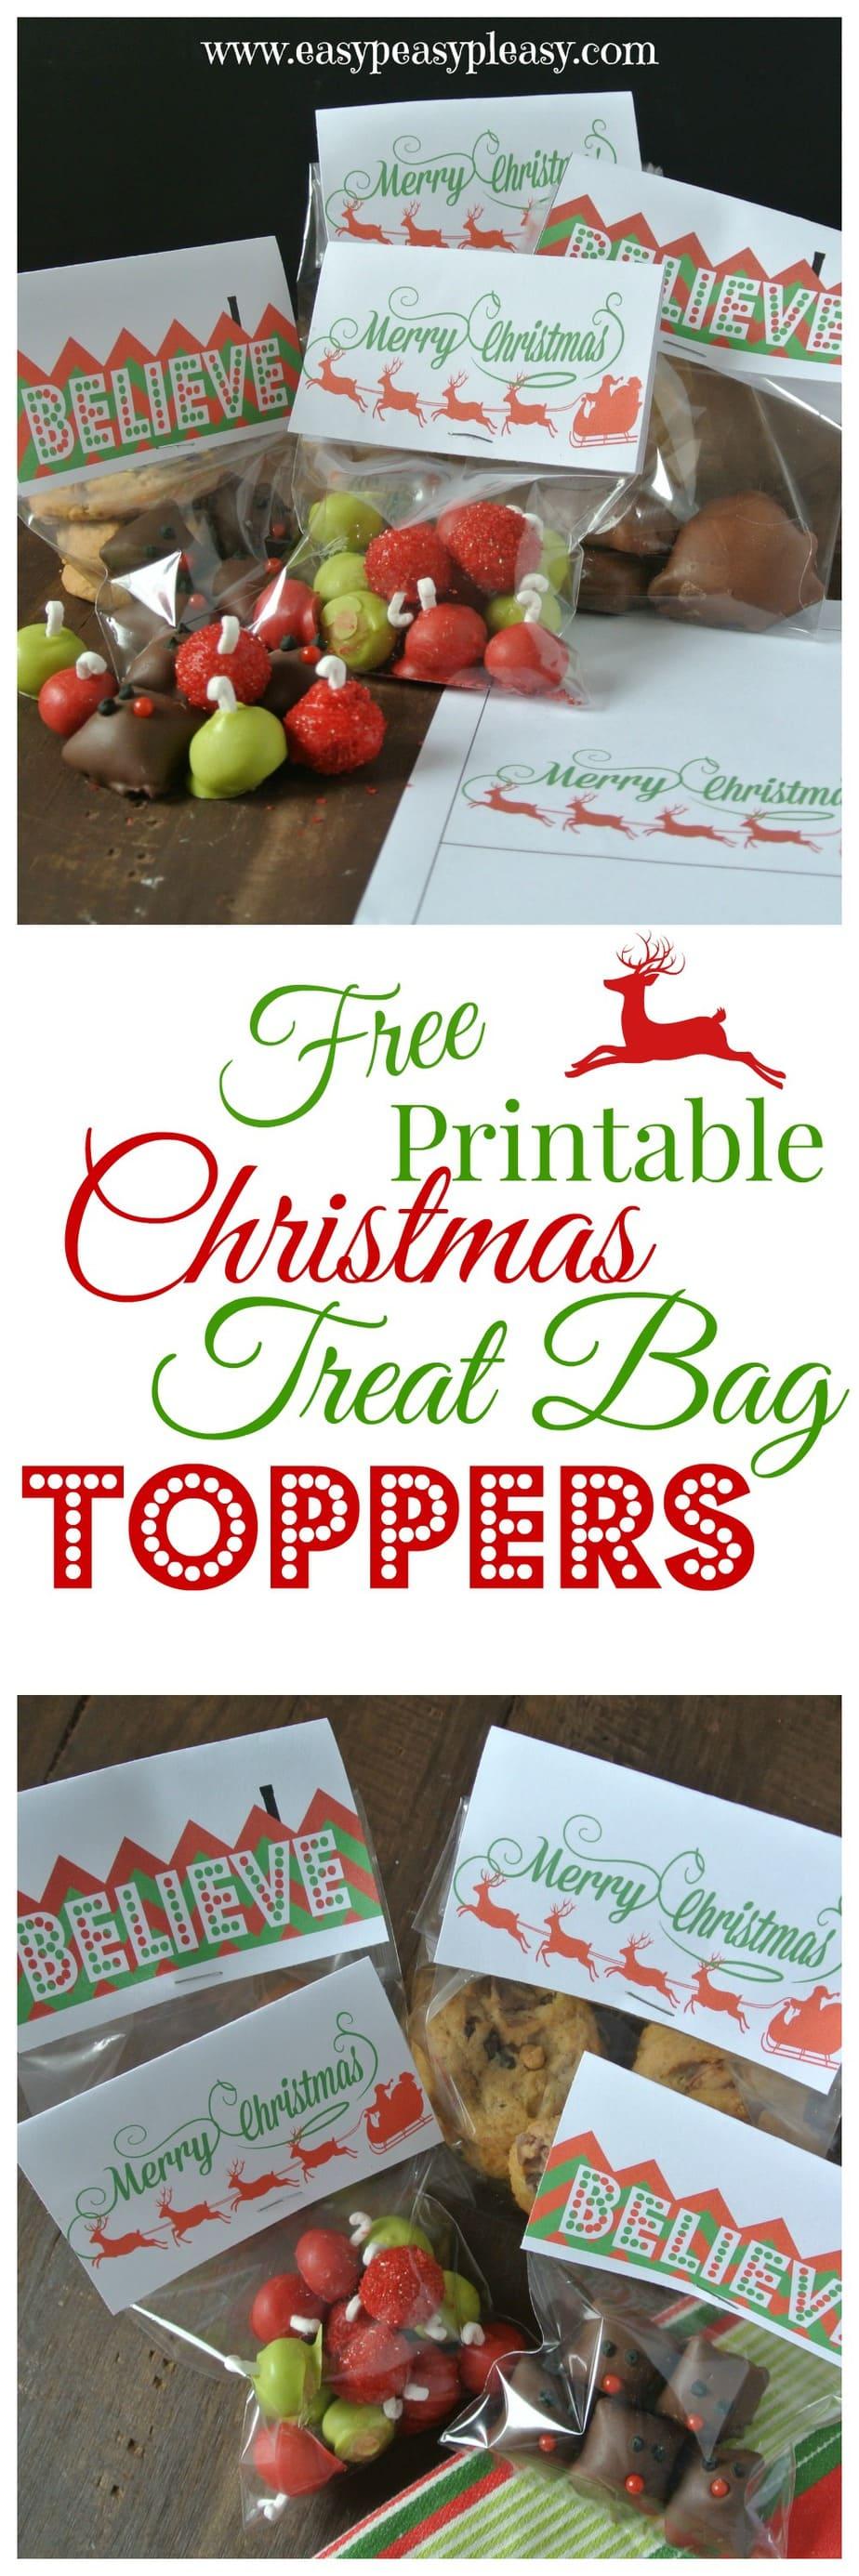 Free printable christmas treat bag toppers easy peasy